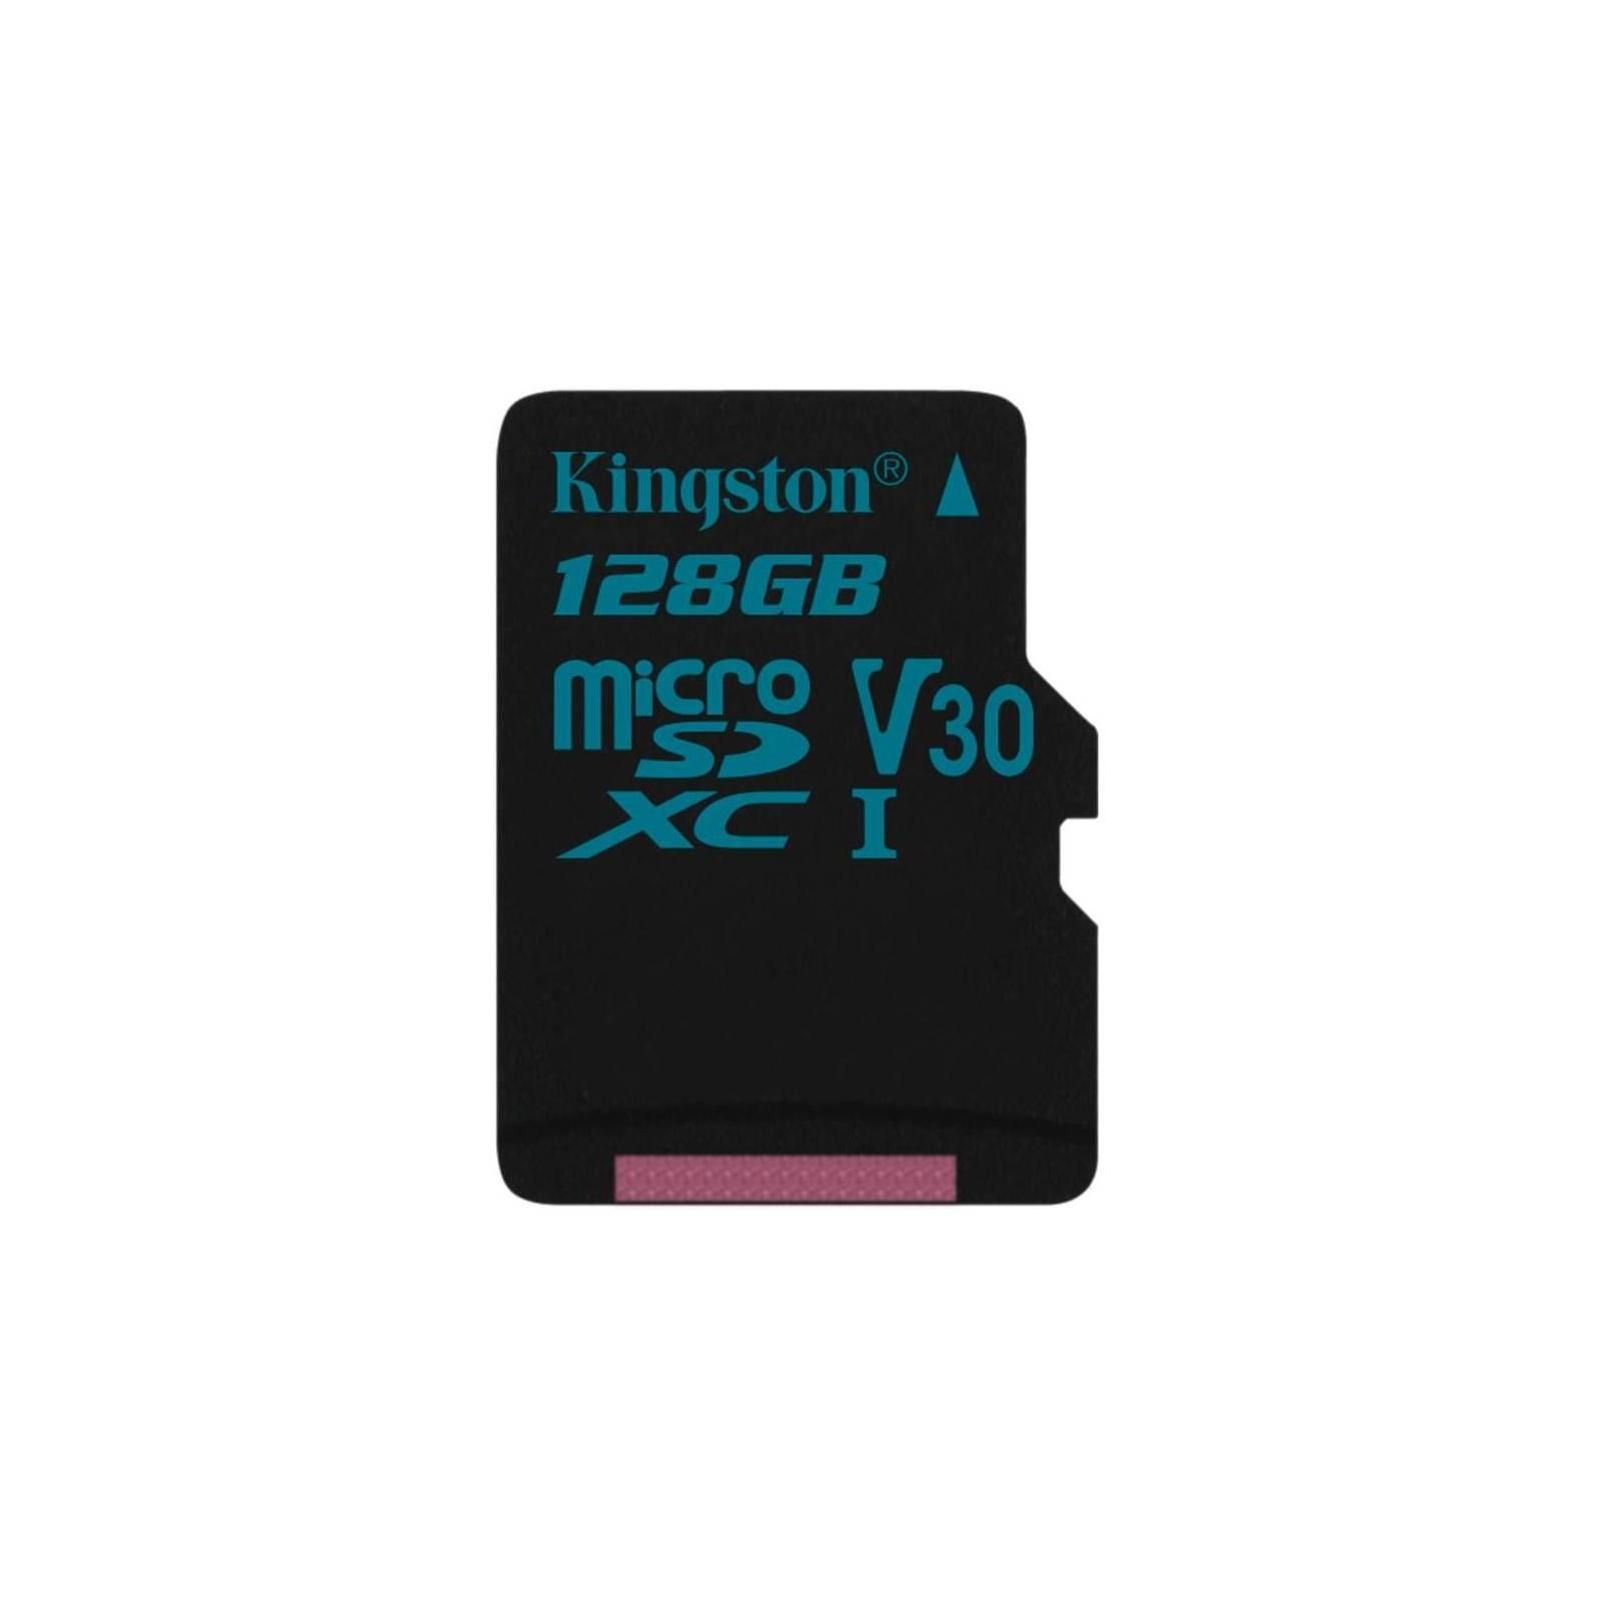 Карта памяти Kingston 128GB microSD class 10 UHS-I U3 Canvas Go (SDCG2/128GBSP)